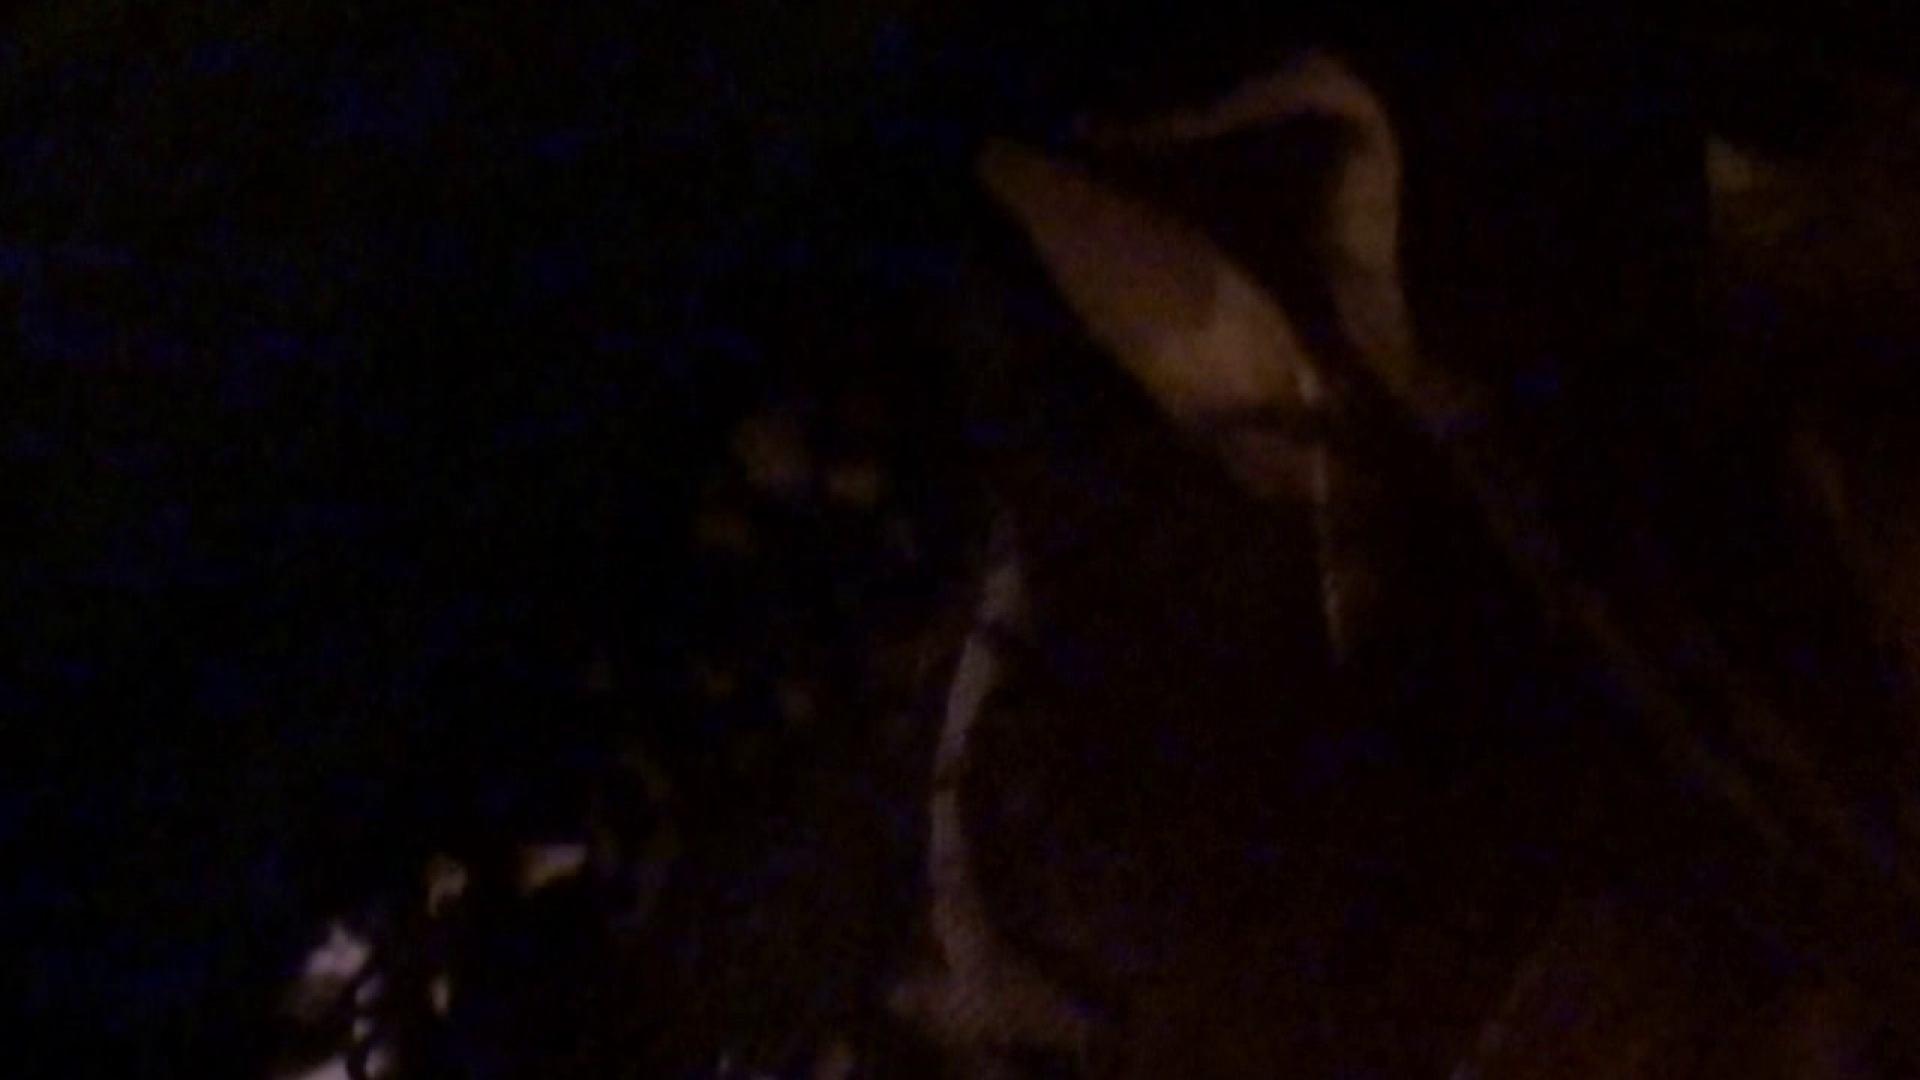 vol.27 【SKちゃん(ホテル)】ガールズバー店員 19歳 ホテルの中 スケベ動画紹介 91枚 4